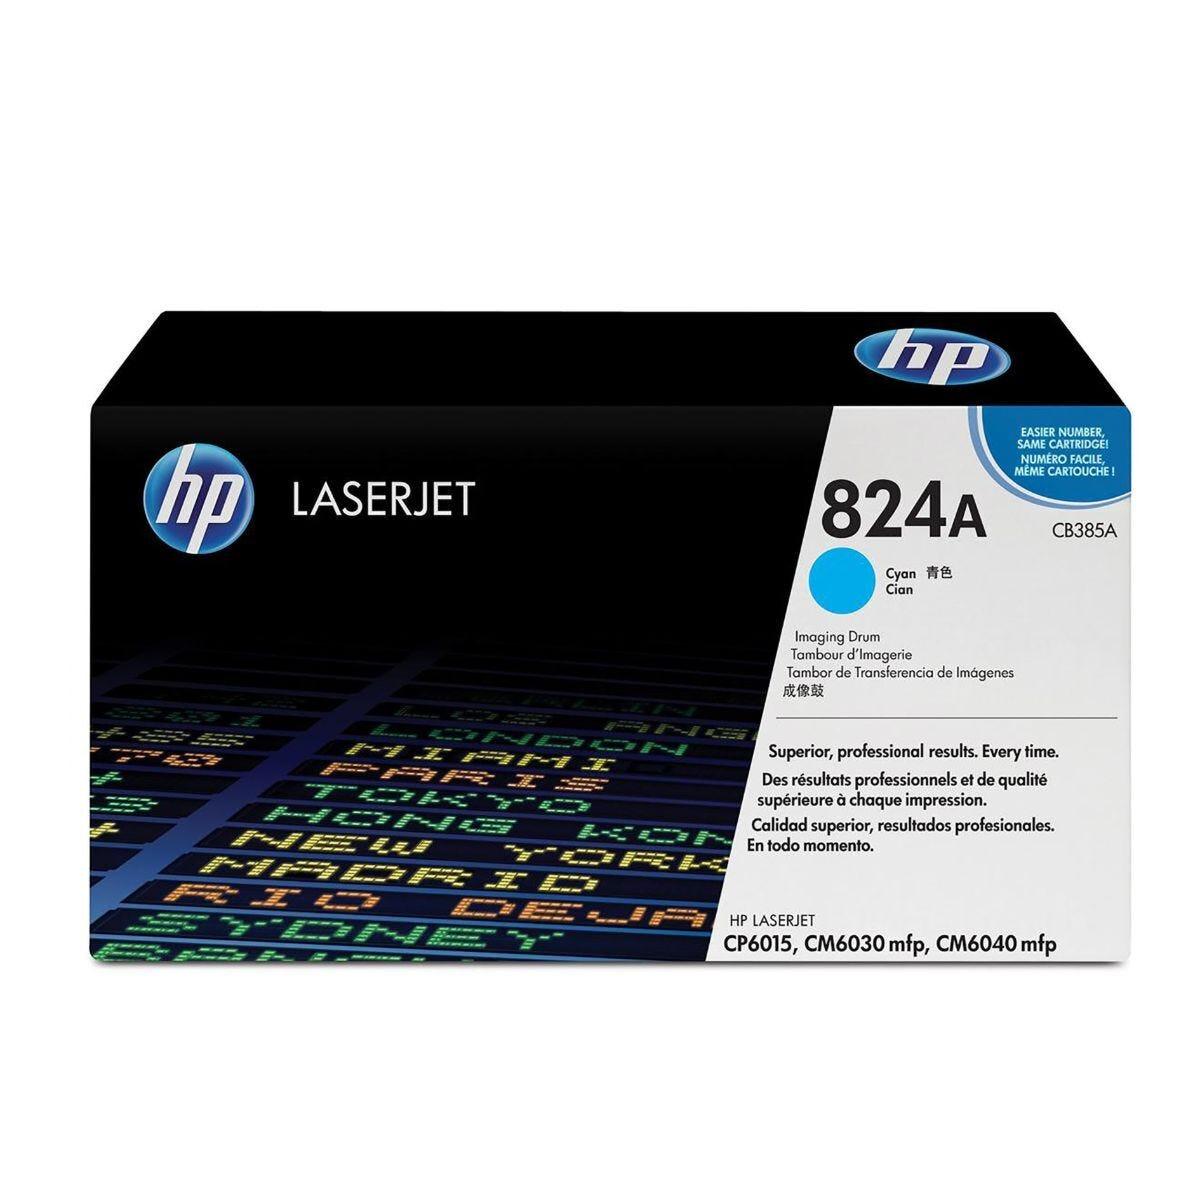 HP 824A Image Drum Cyan